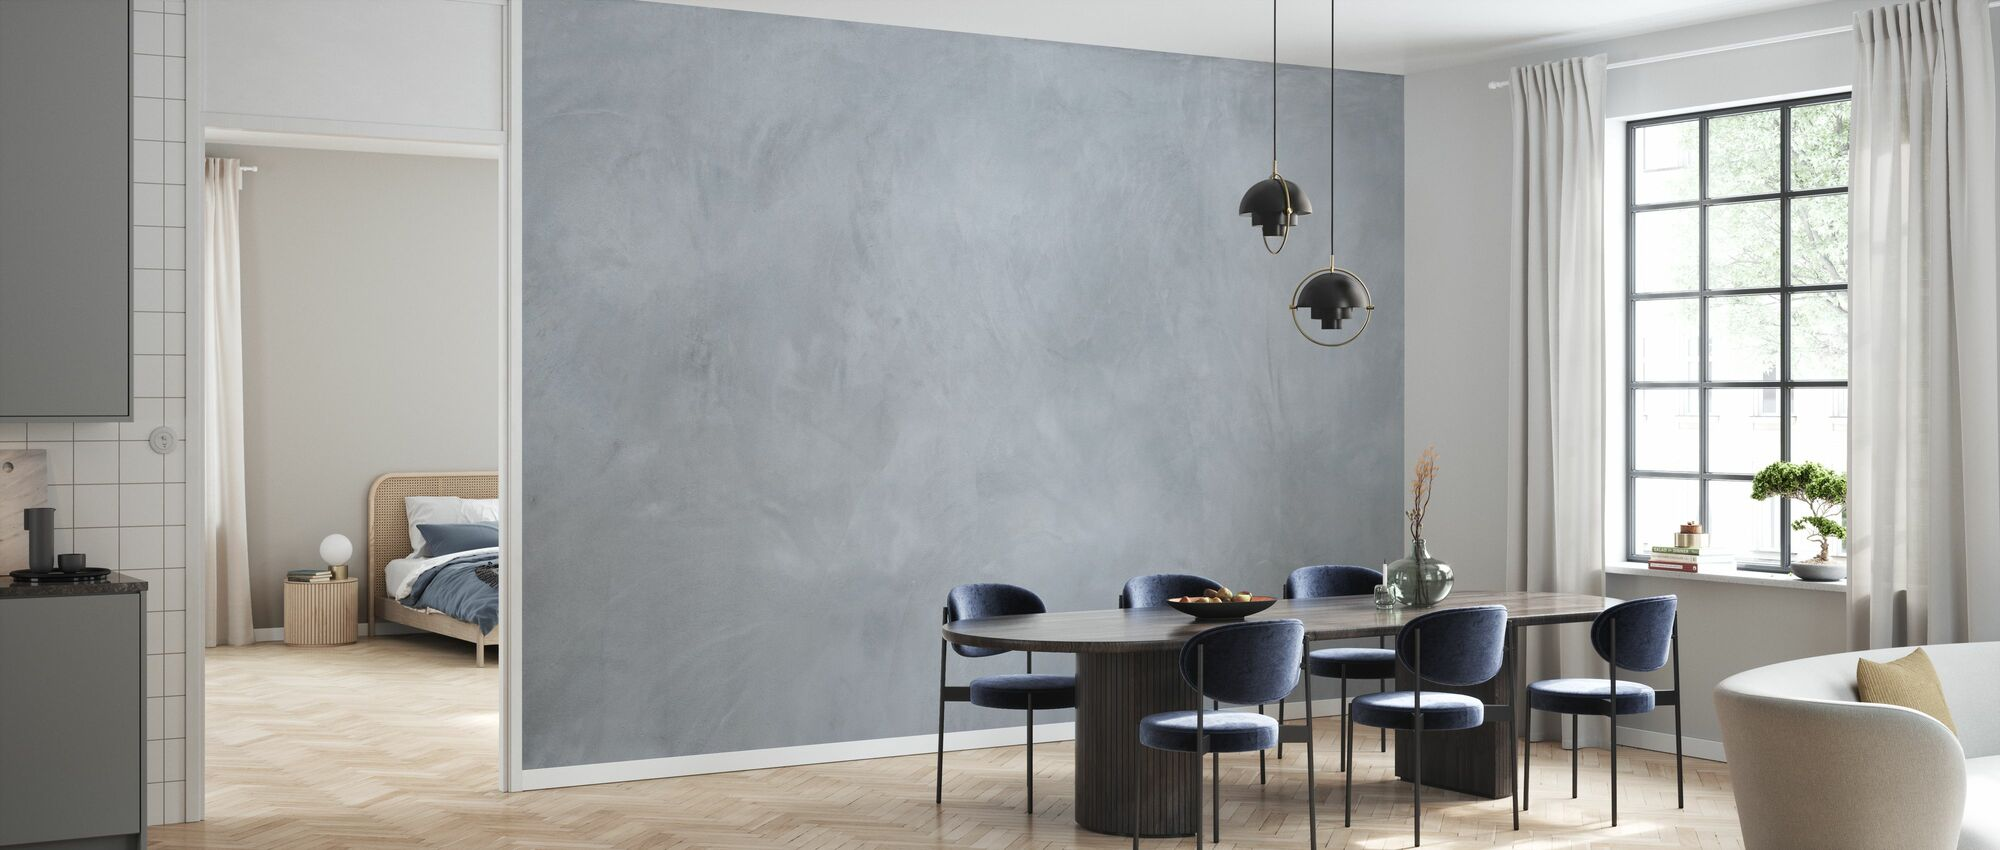 Stucco Wall - Wallpaper - Kitchen